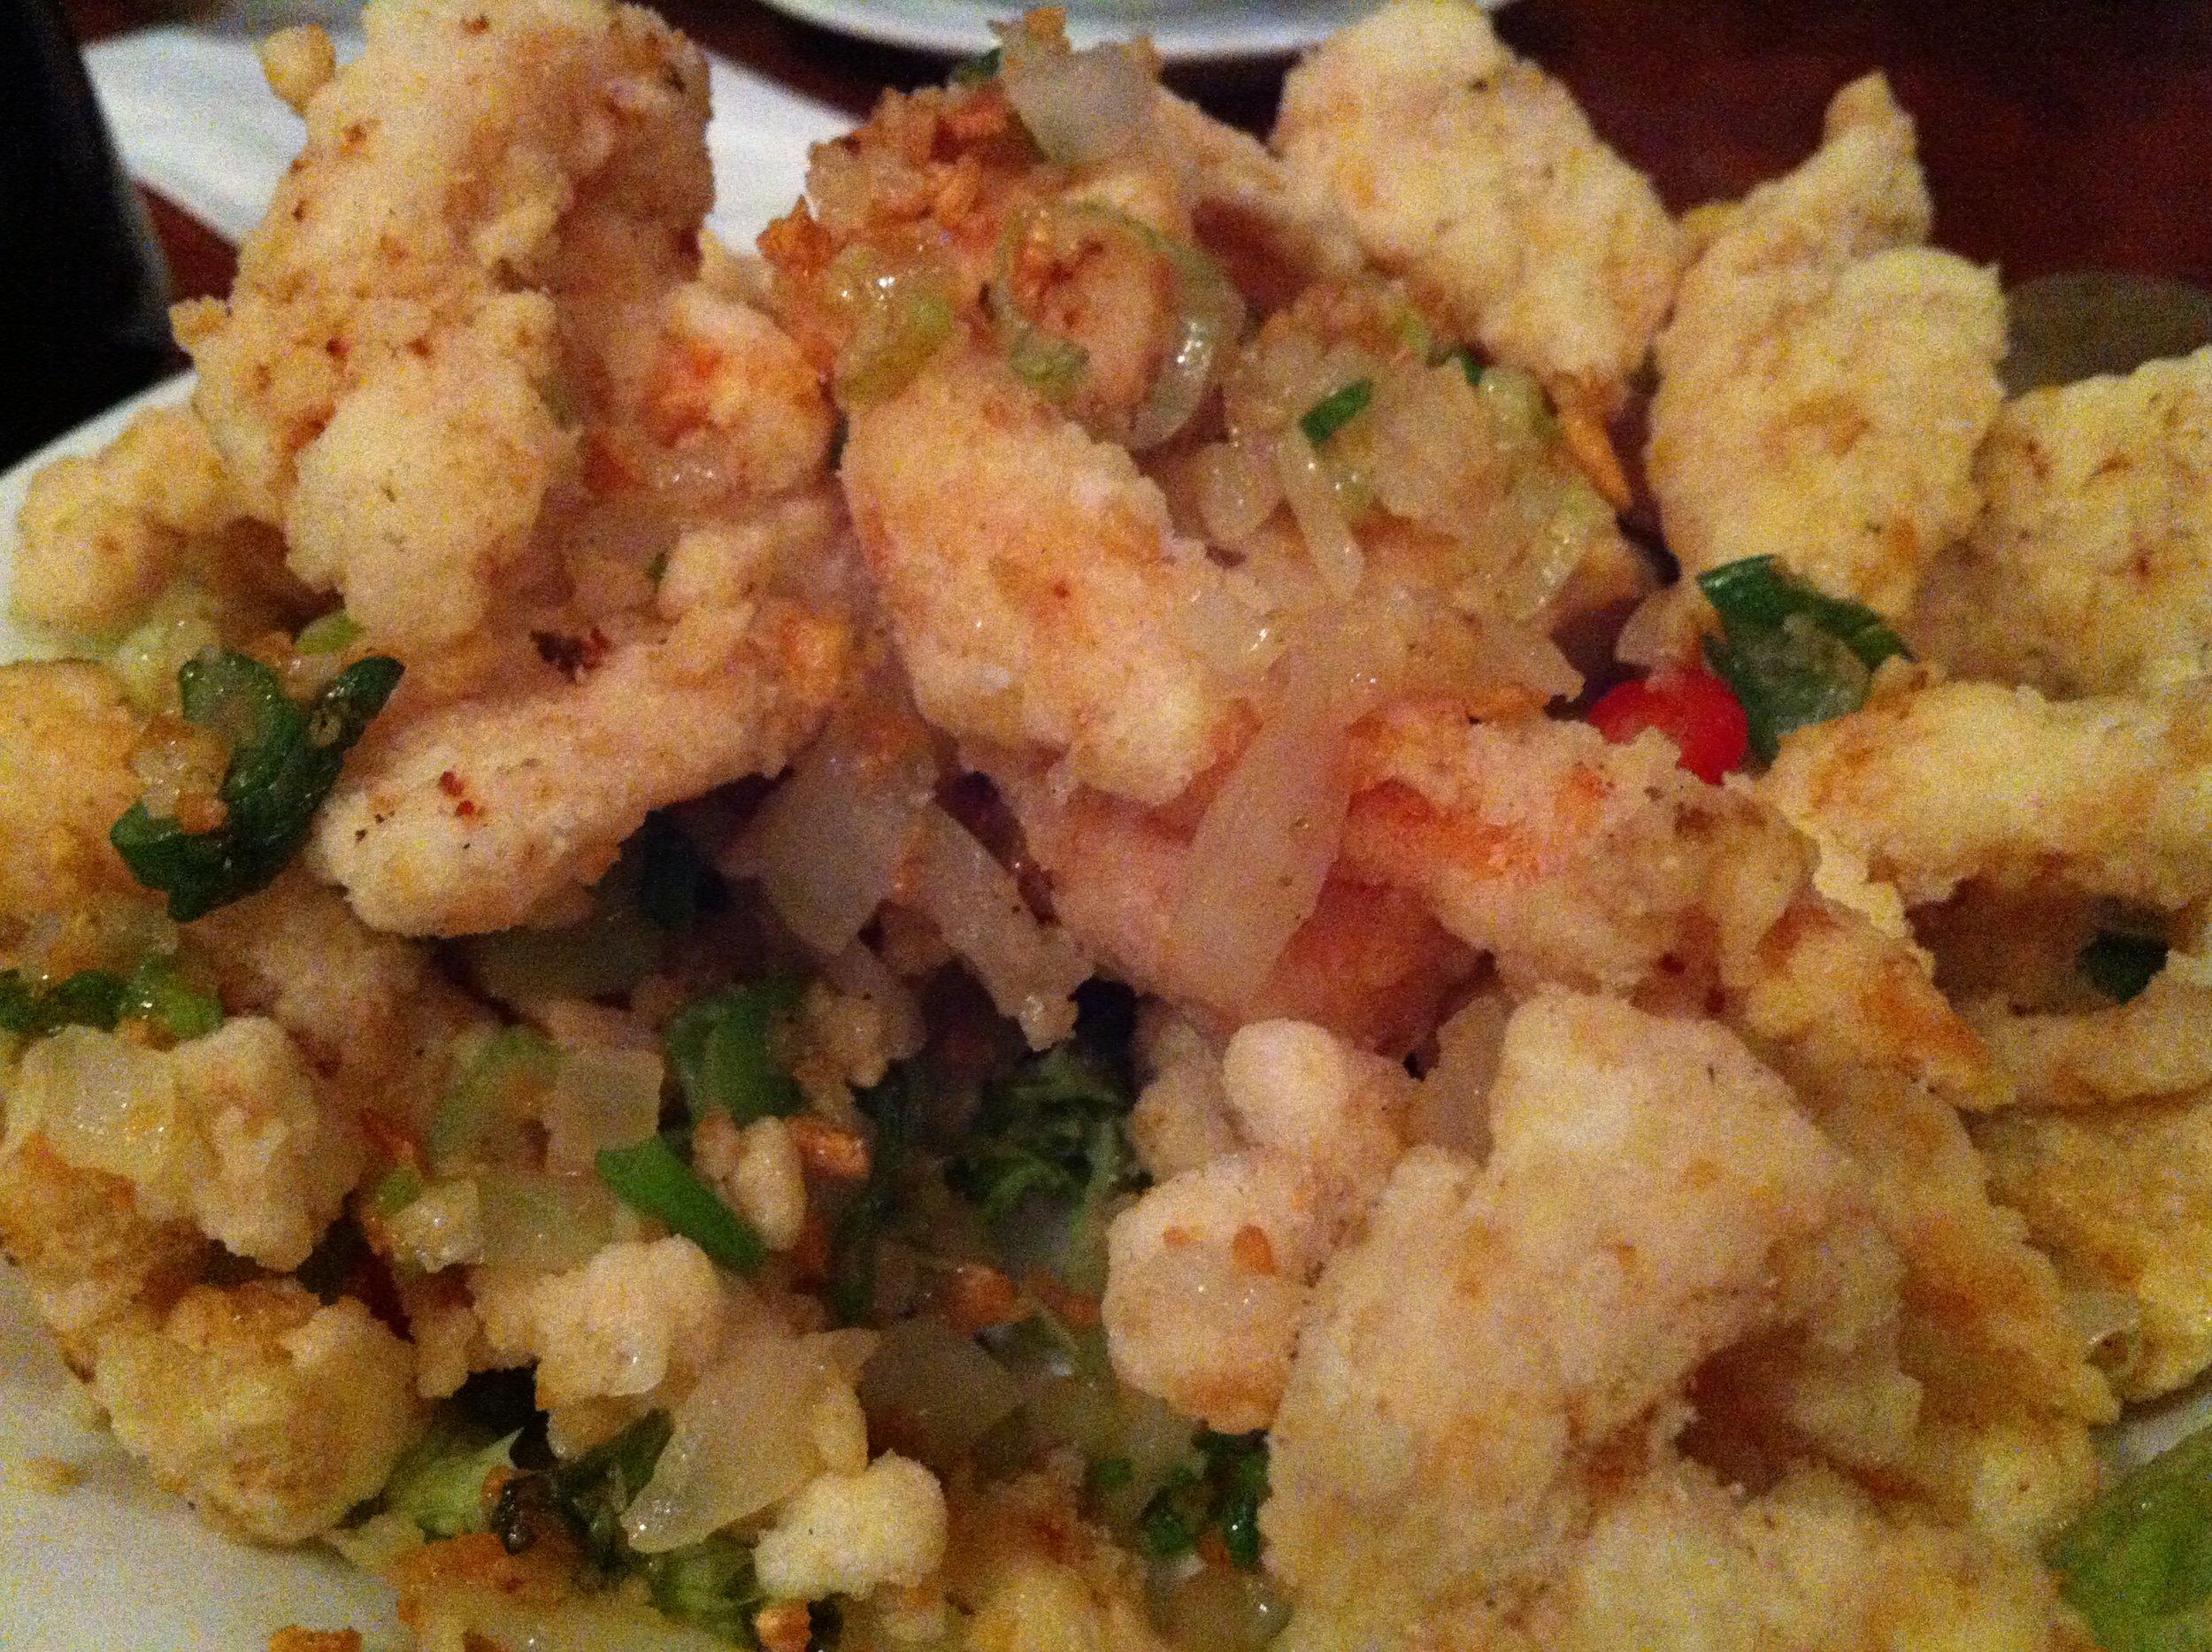 Salt n pepper chicken at Beijing Dumpling in Chinatown, London